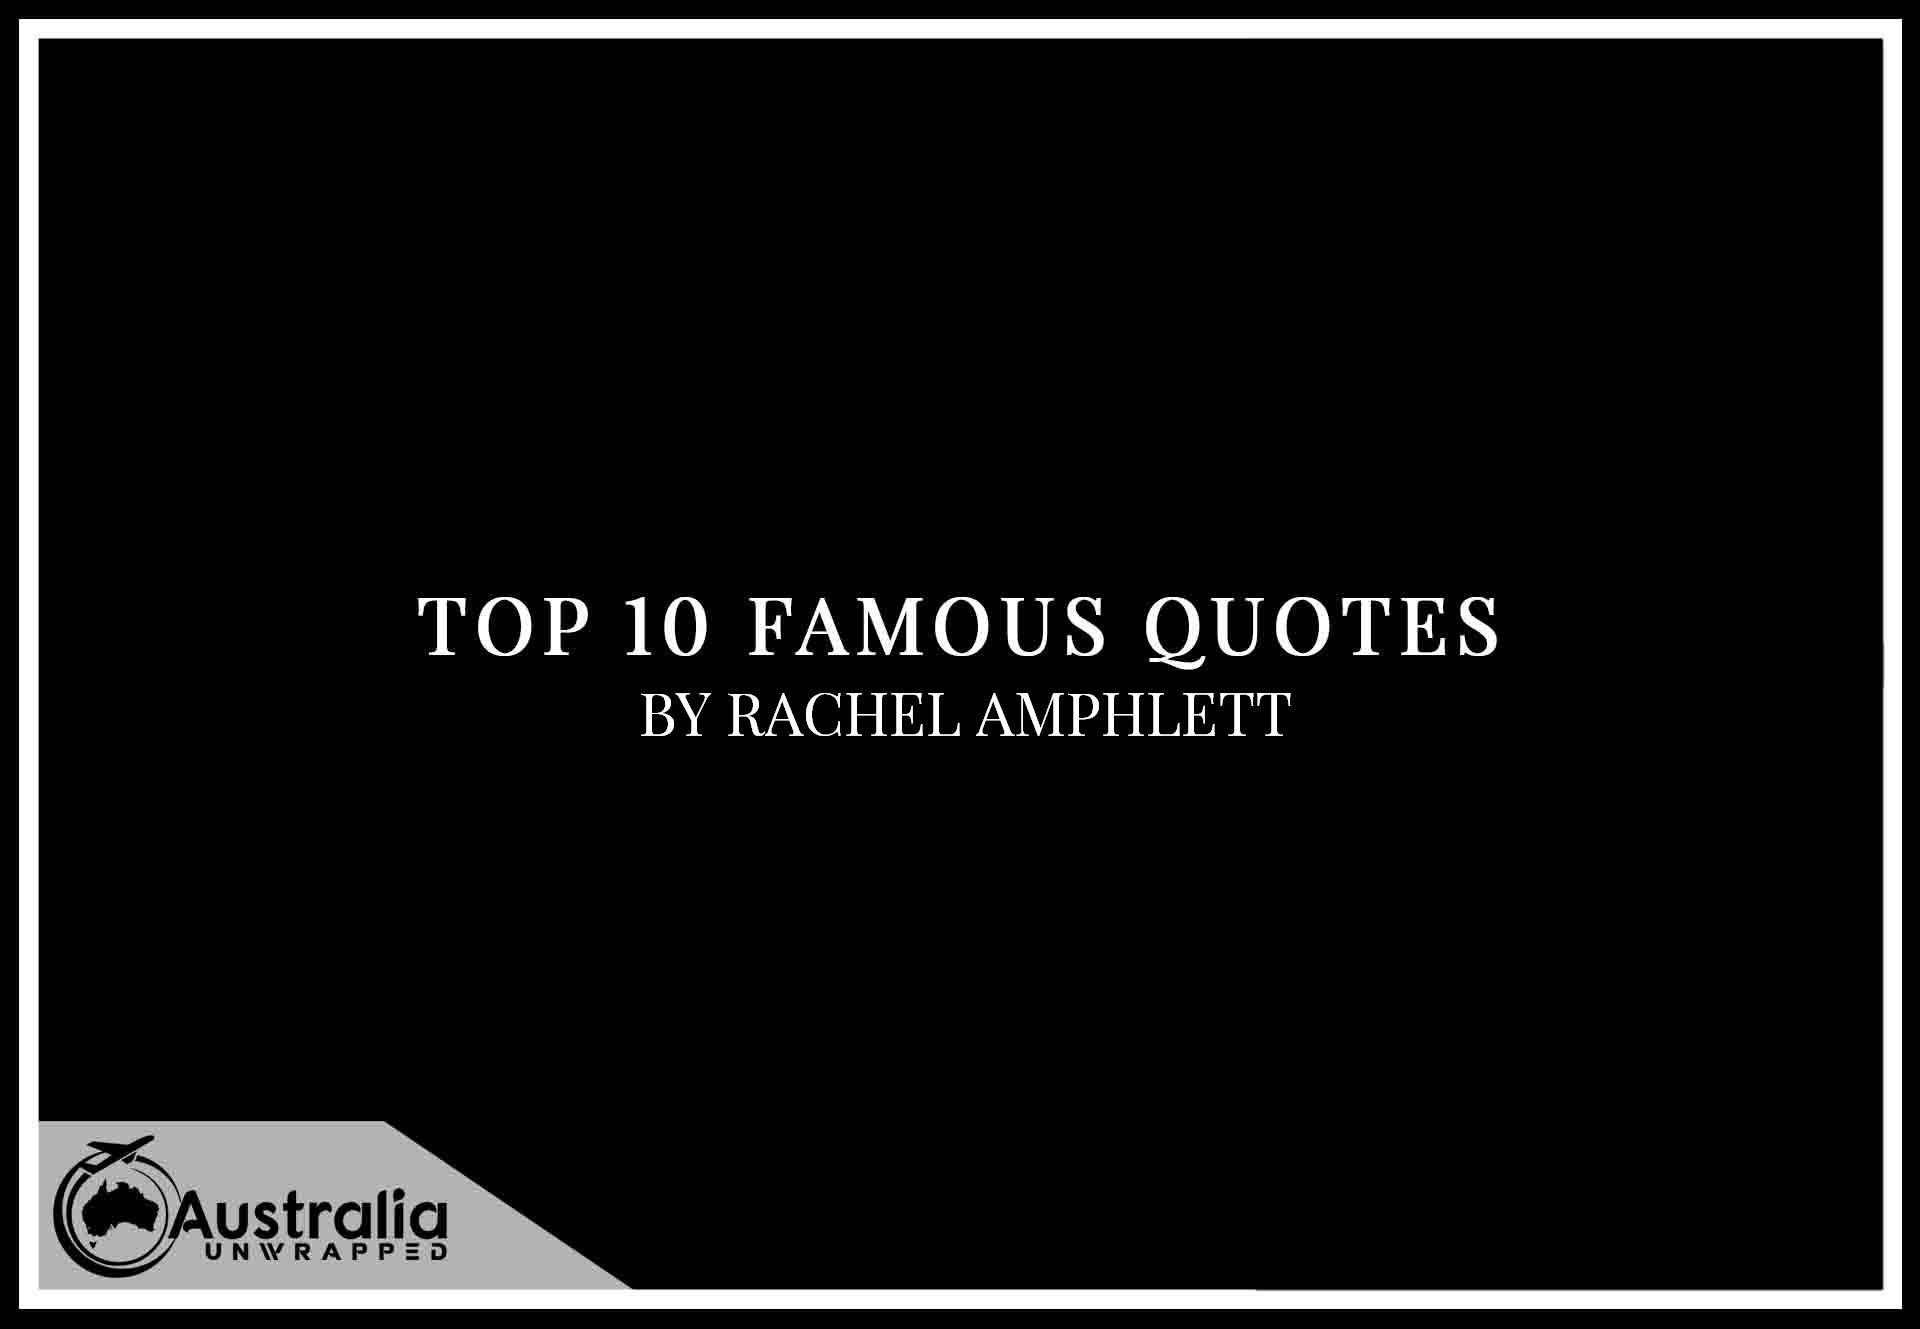 Top 10 Famous Quotes by Author Rachel Amphlett